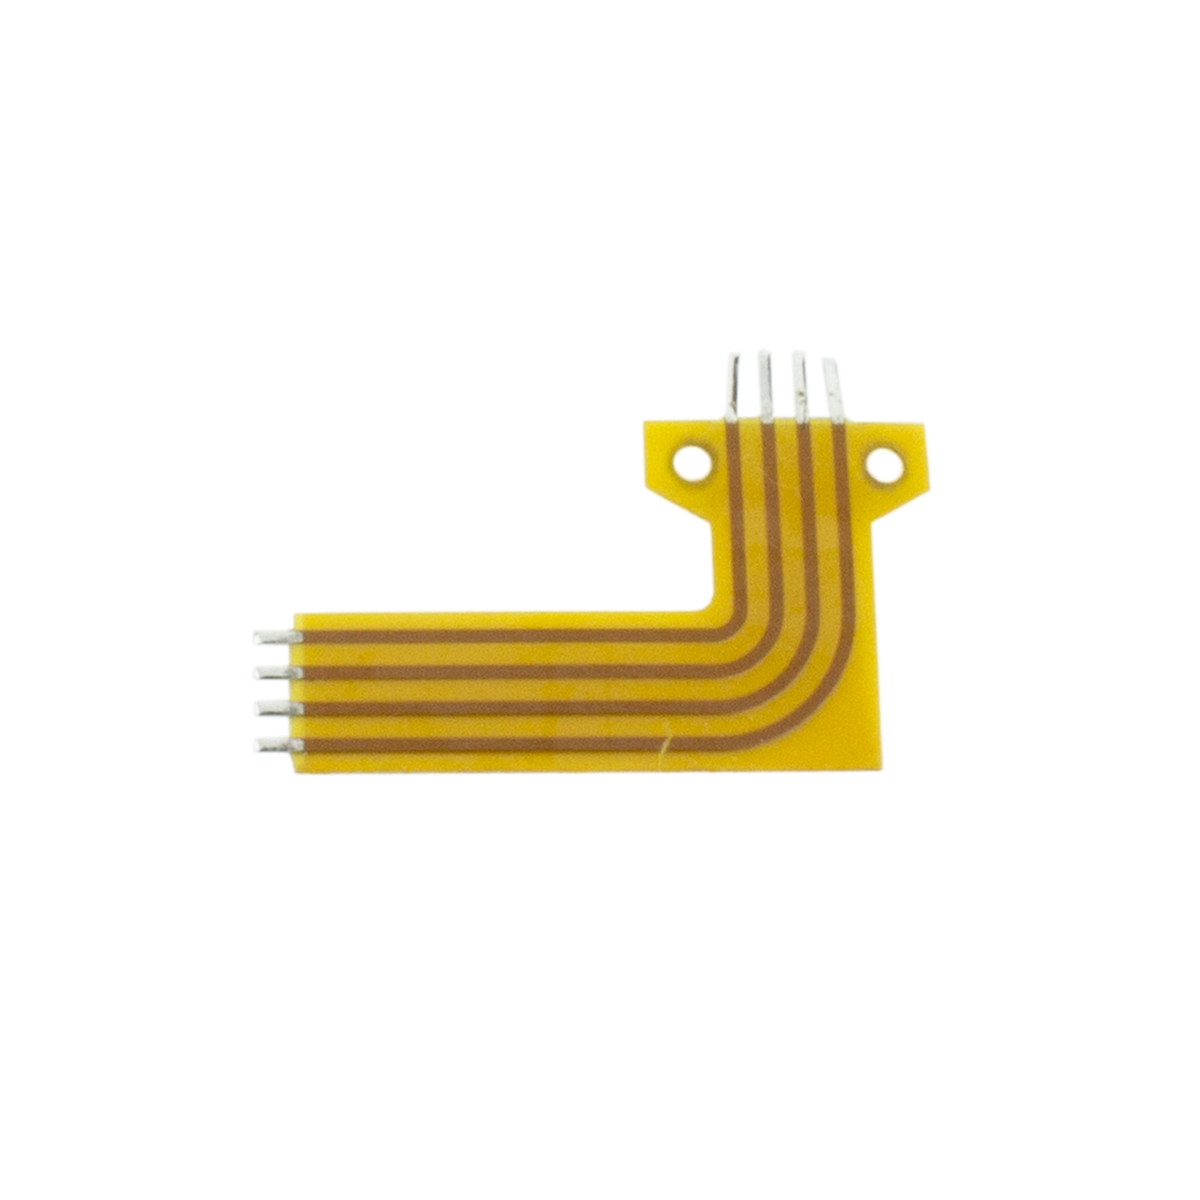 Philips Avalon M2734A M2735A TOCO Smart Transducer Gauge Flex Cable